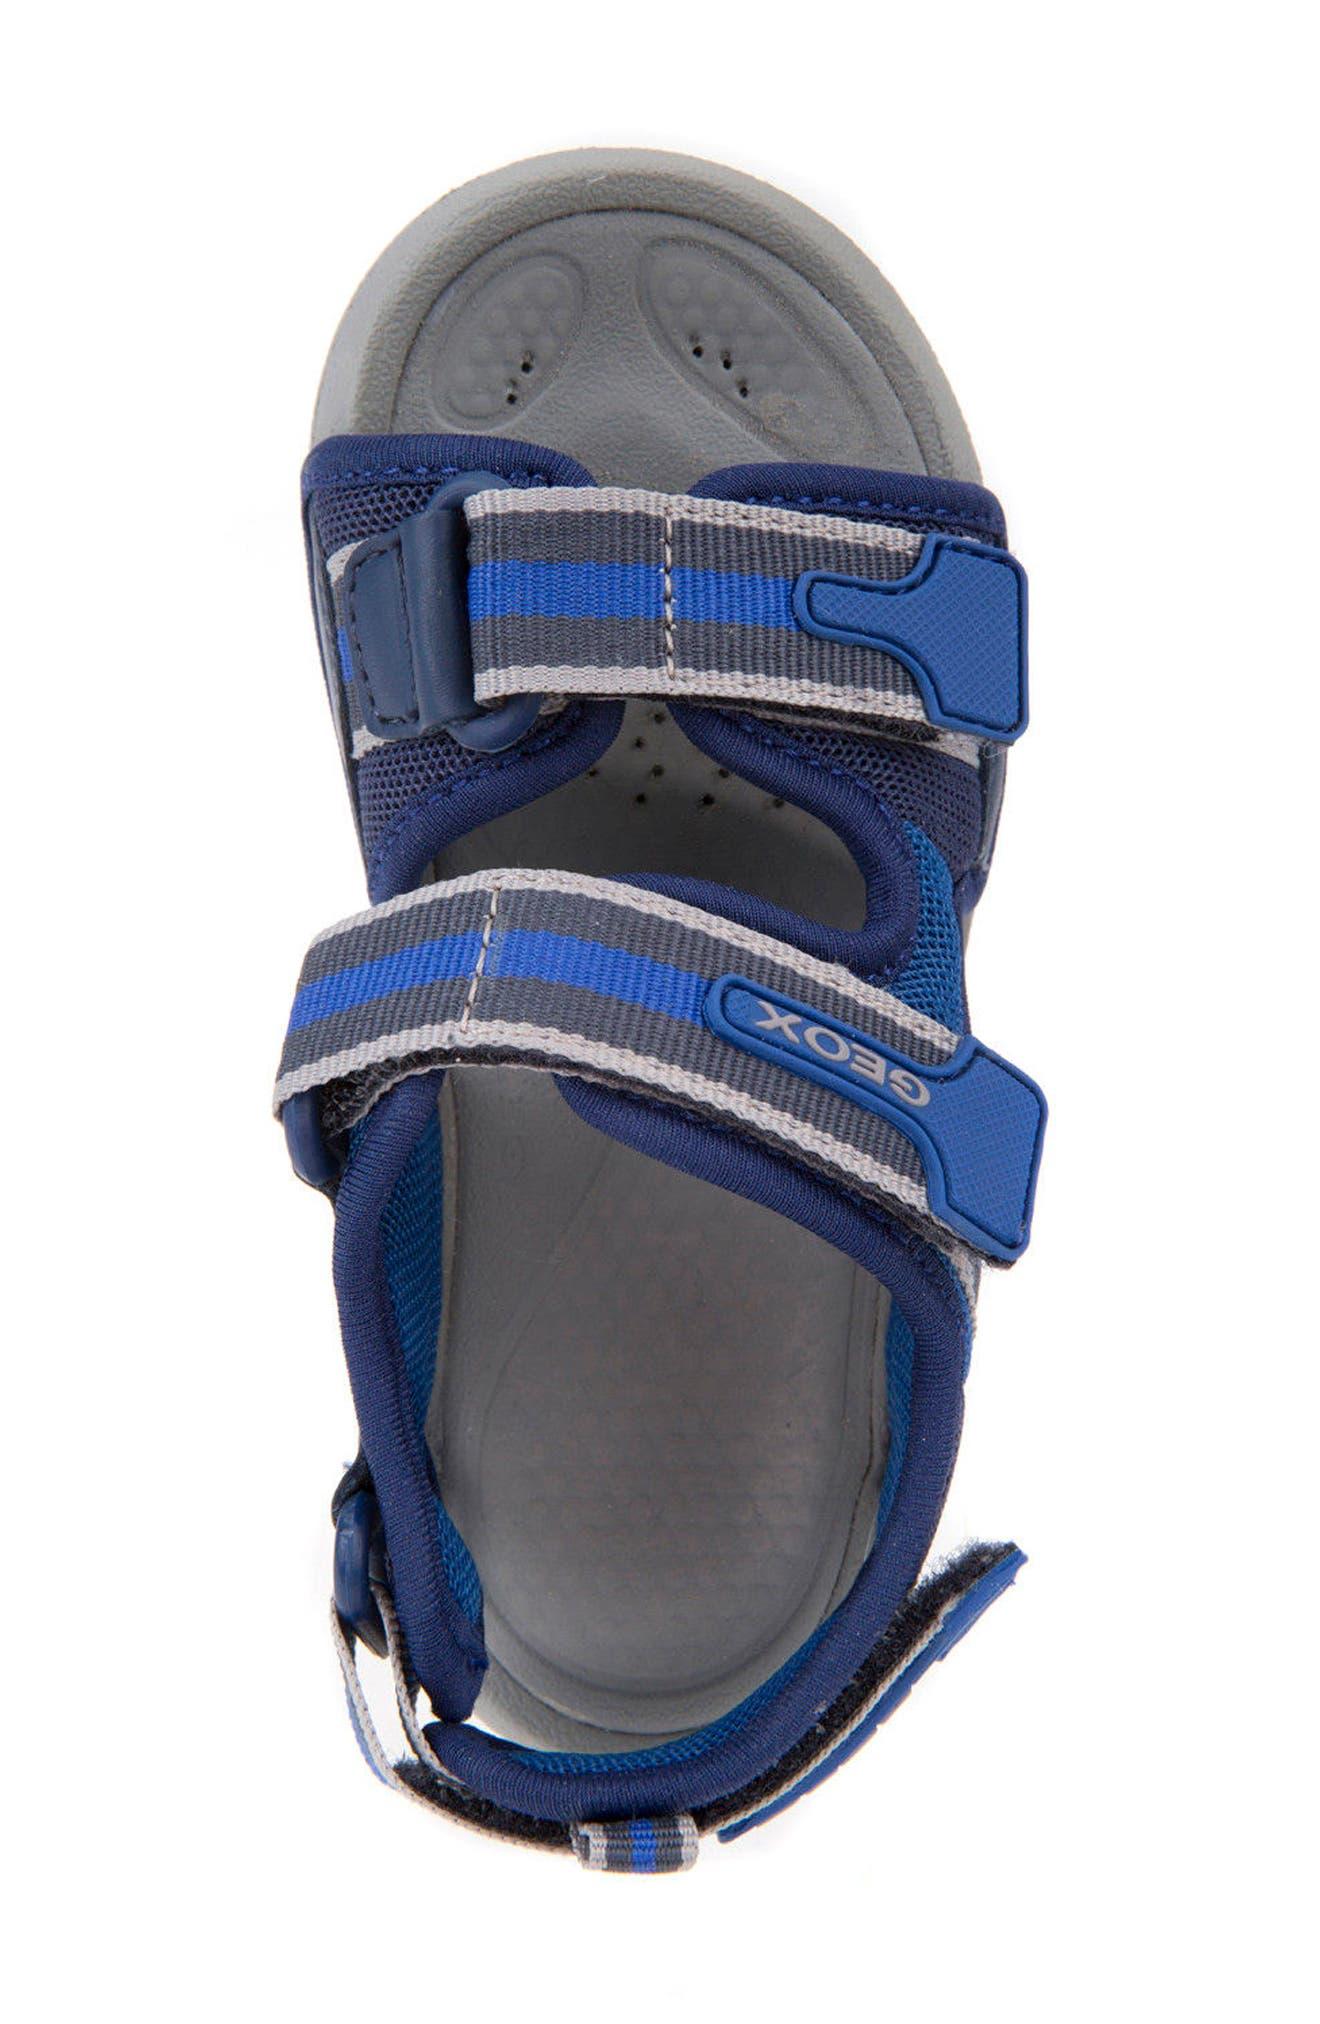 Ultrak Sandal,                             Alternate thumbnail 4, color,                             NAVY/ ROYAL